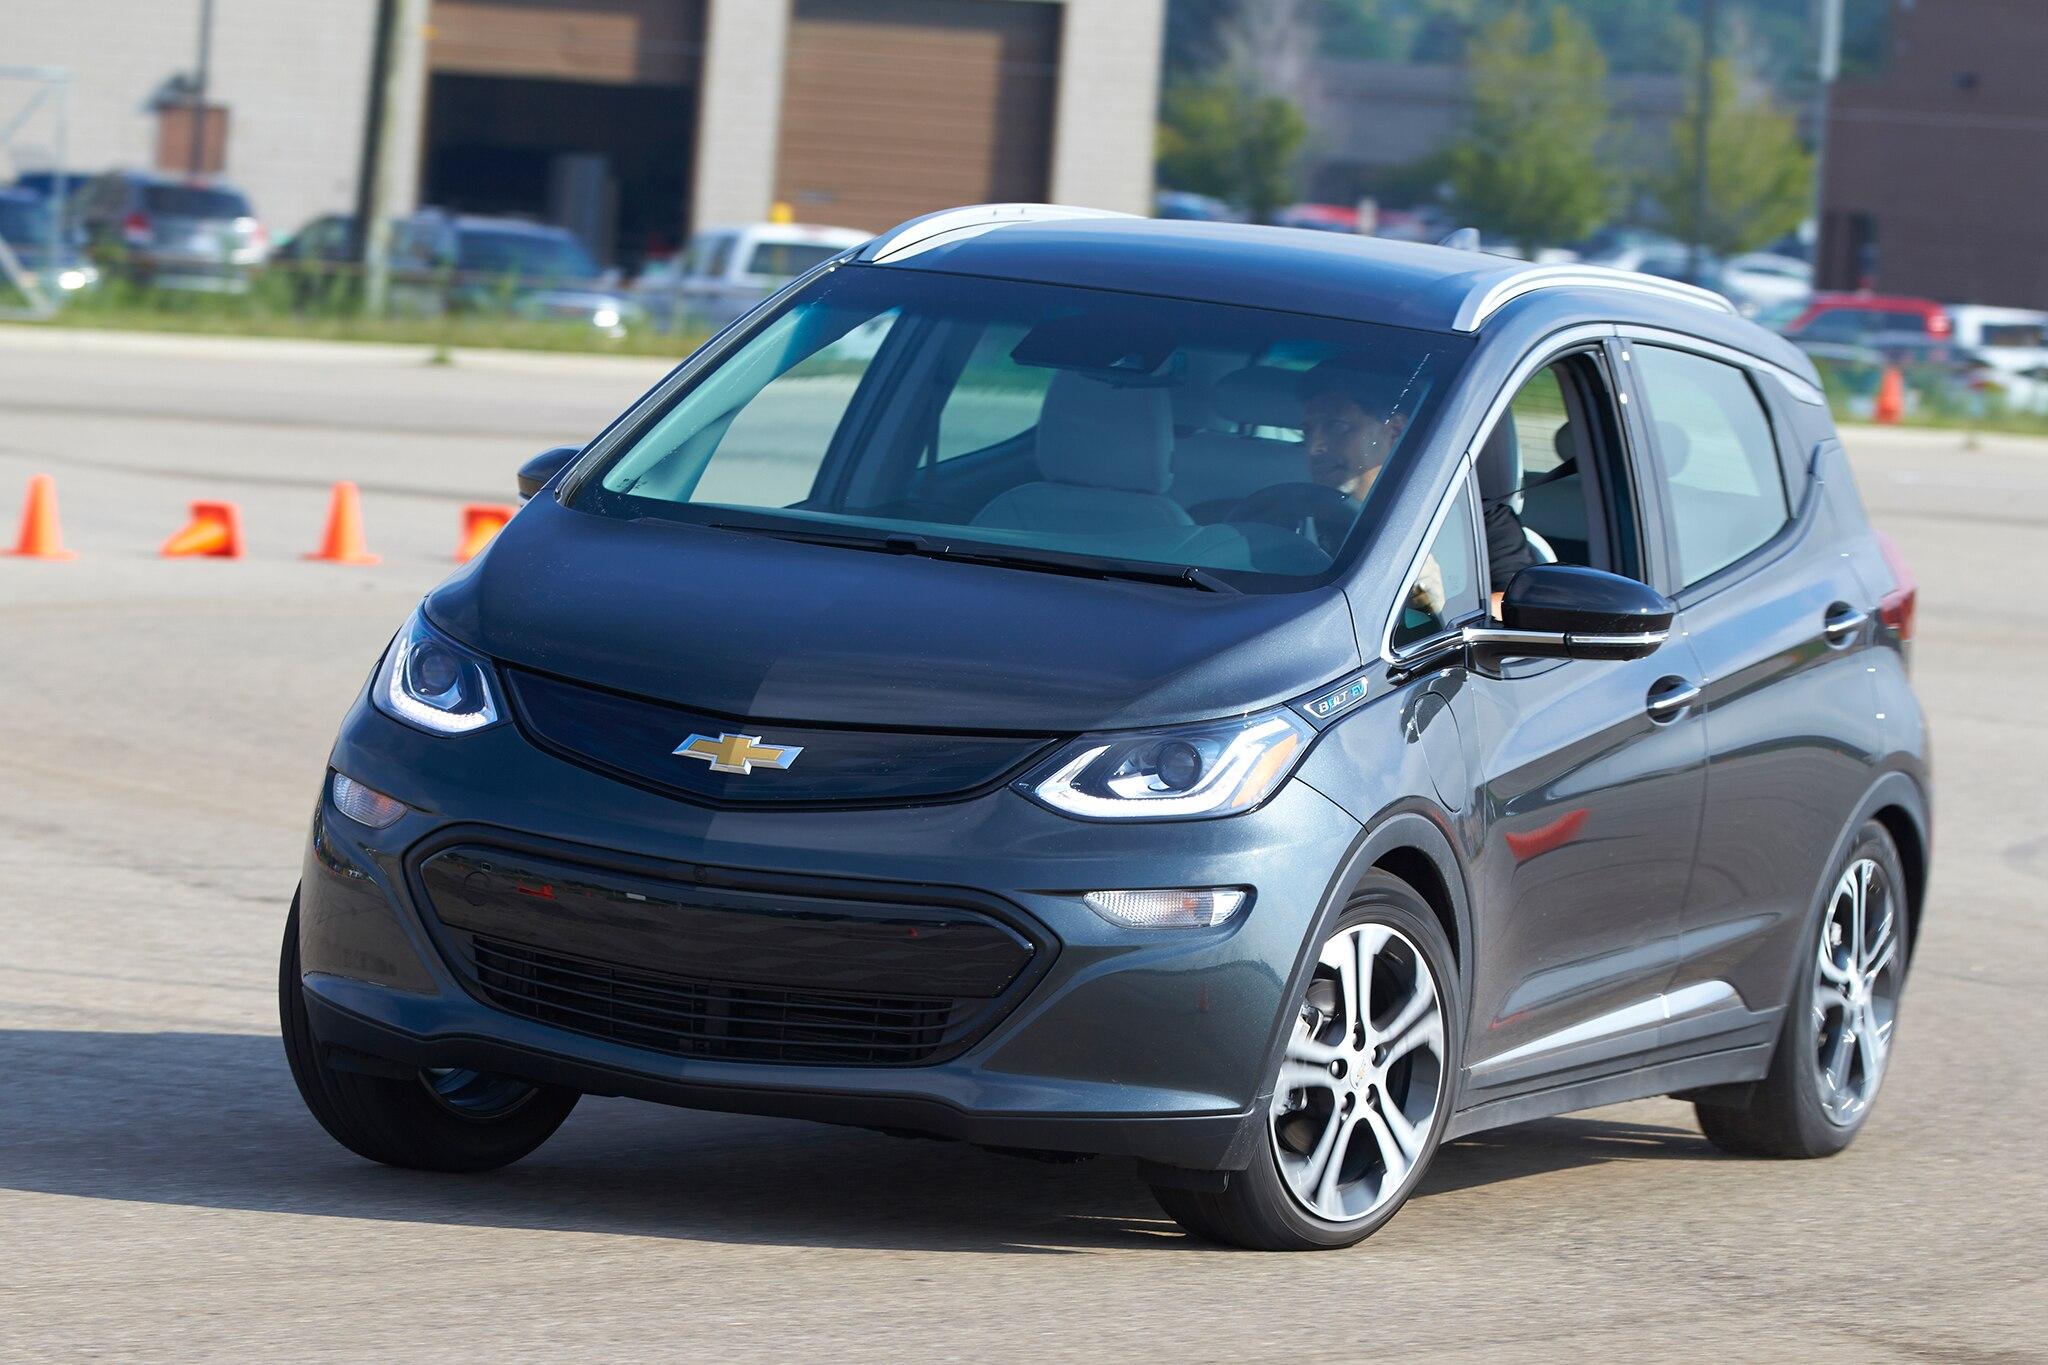 2017 Chevrolet Bolt EV Front Three Quarter In Motion 05